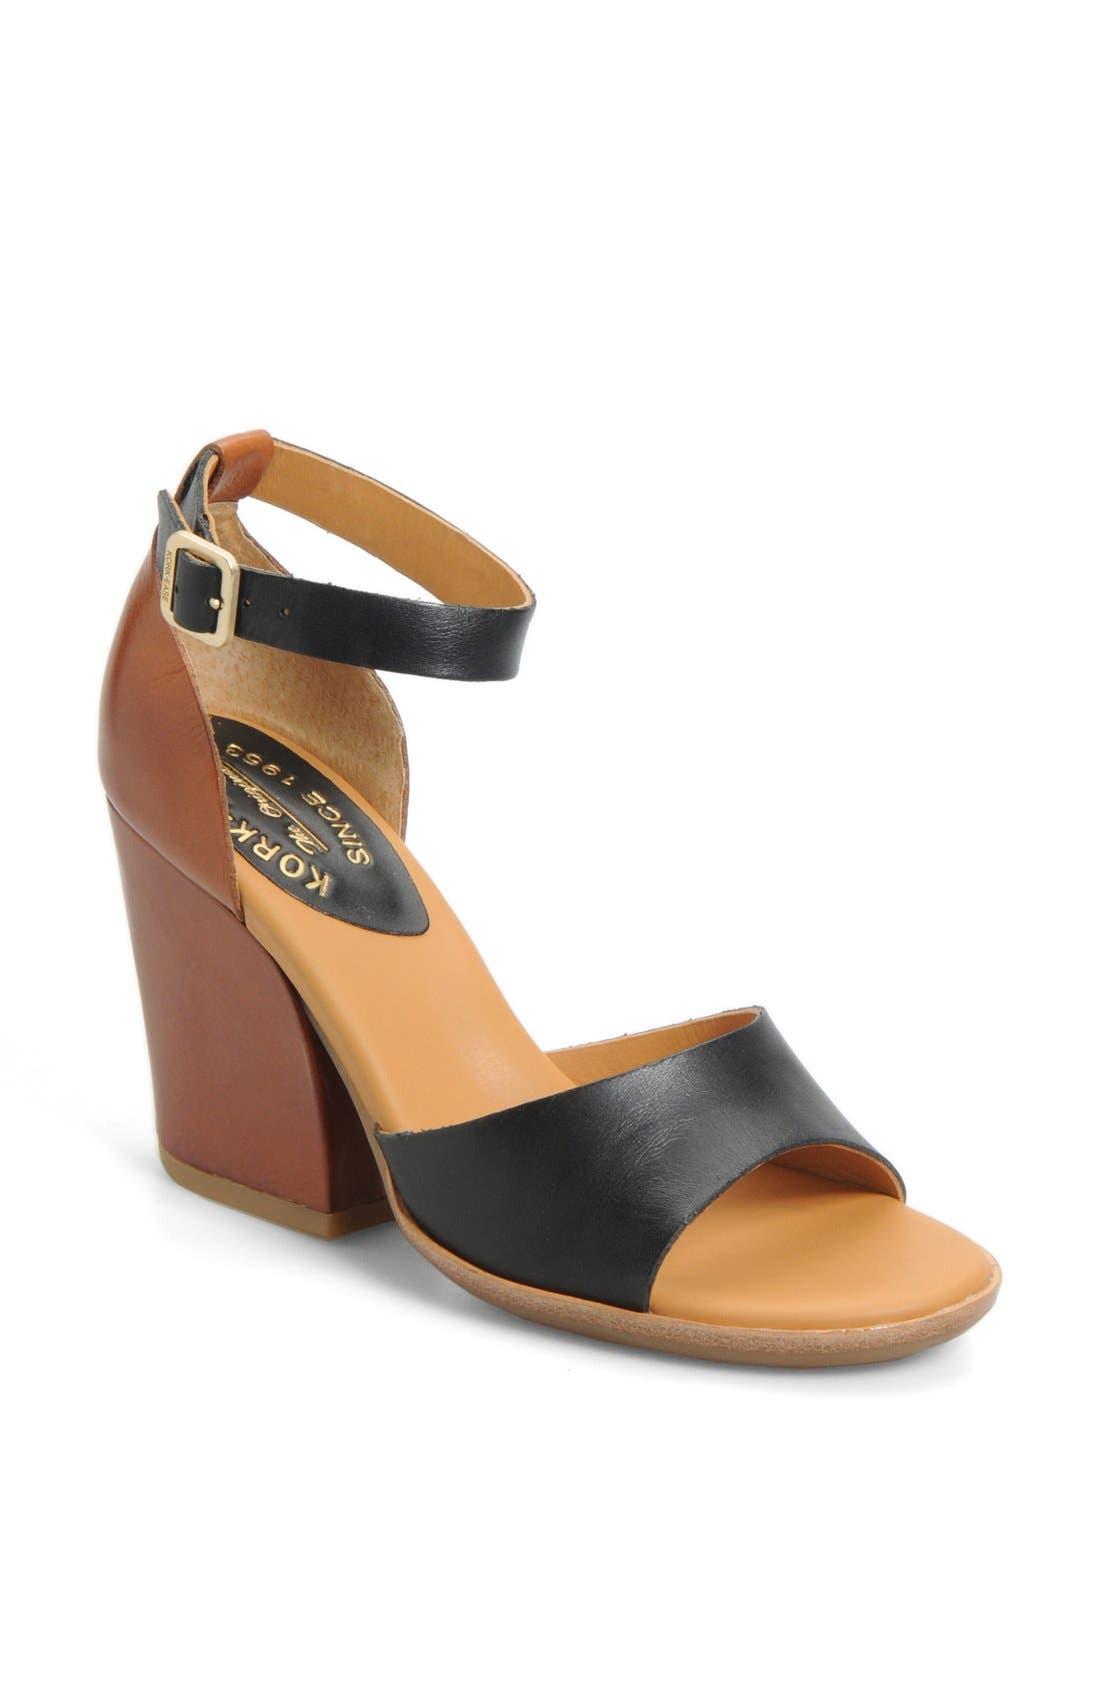 Main Image - Kork-Ease® 'Mimi' Sandal (Women)